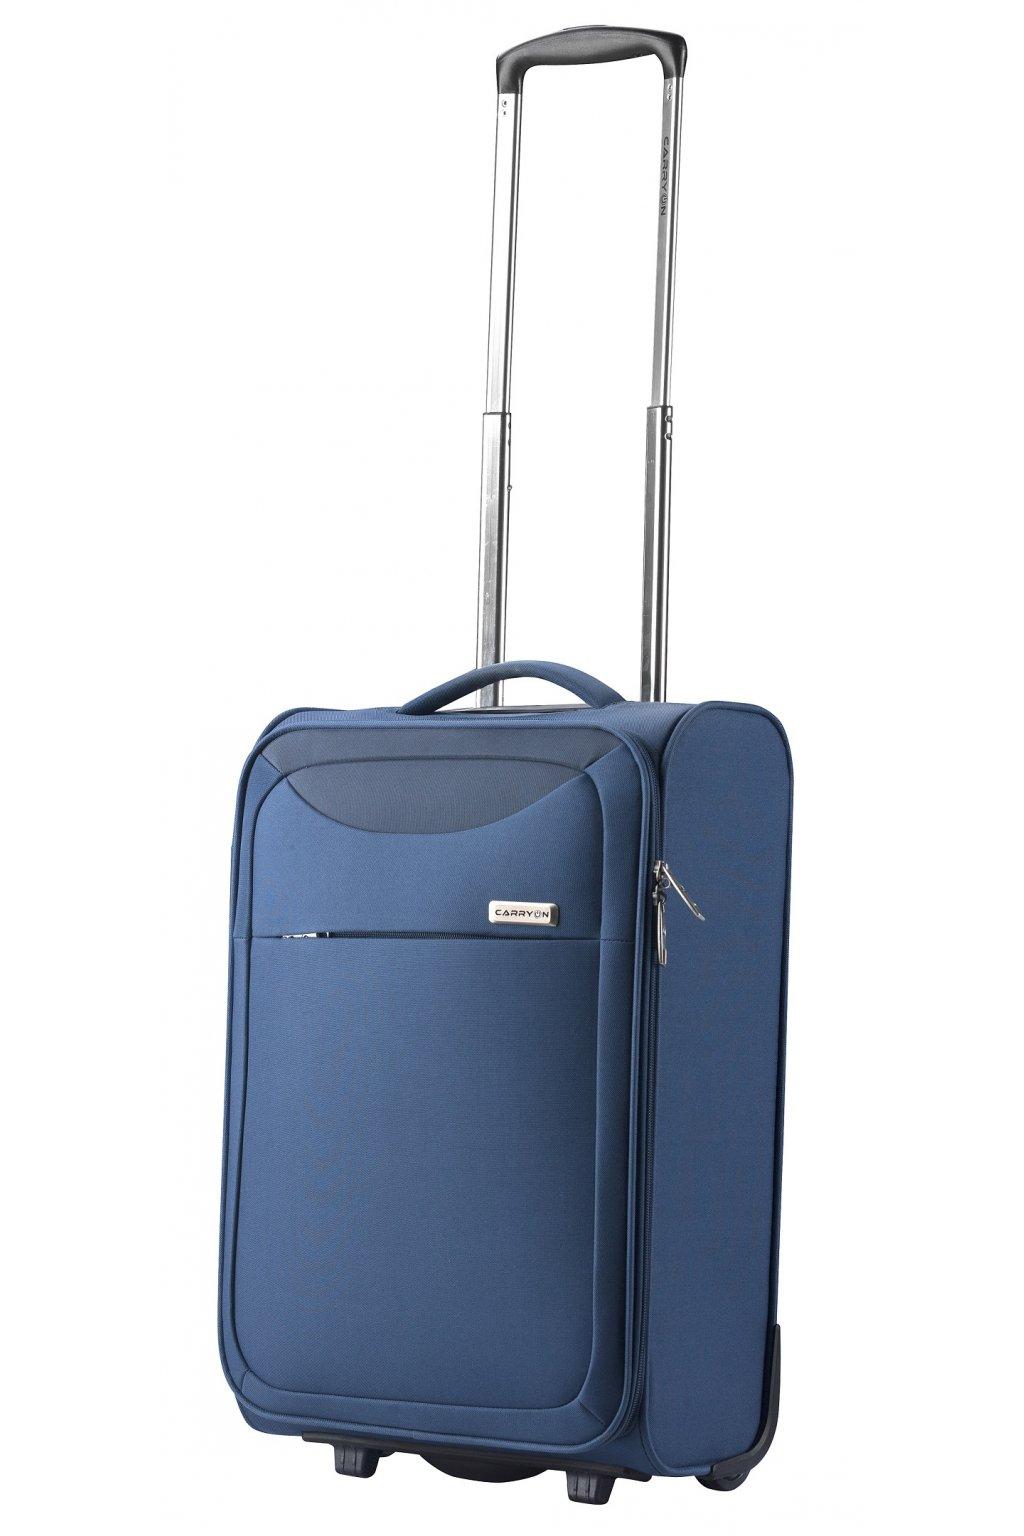 kufrland carryon air blue (6)